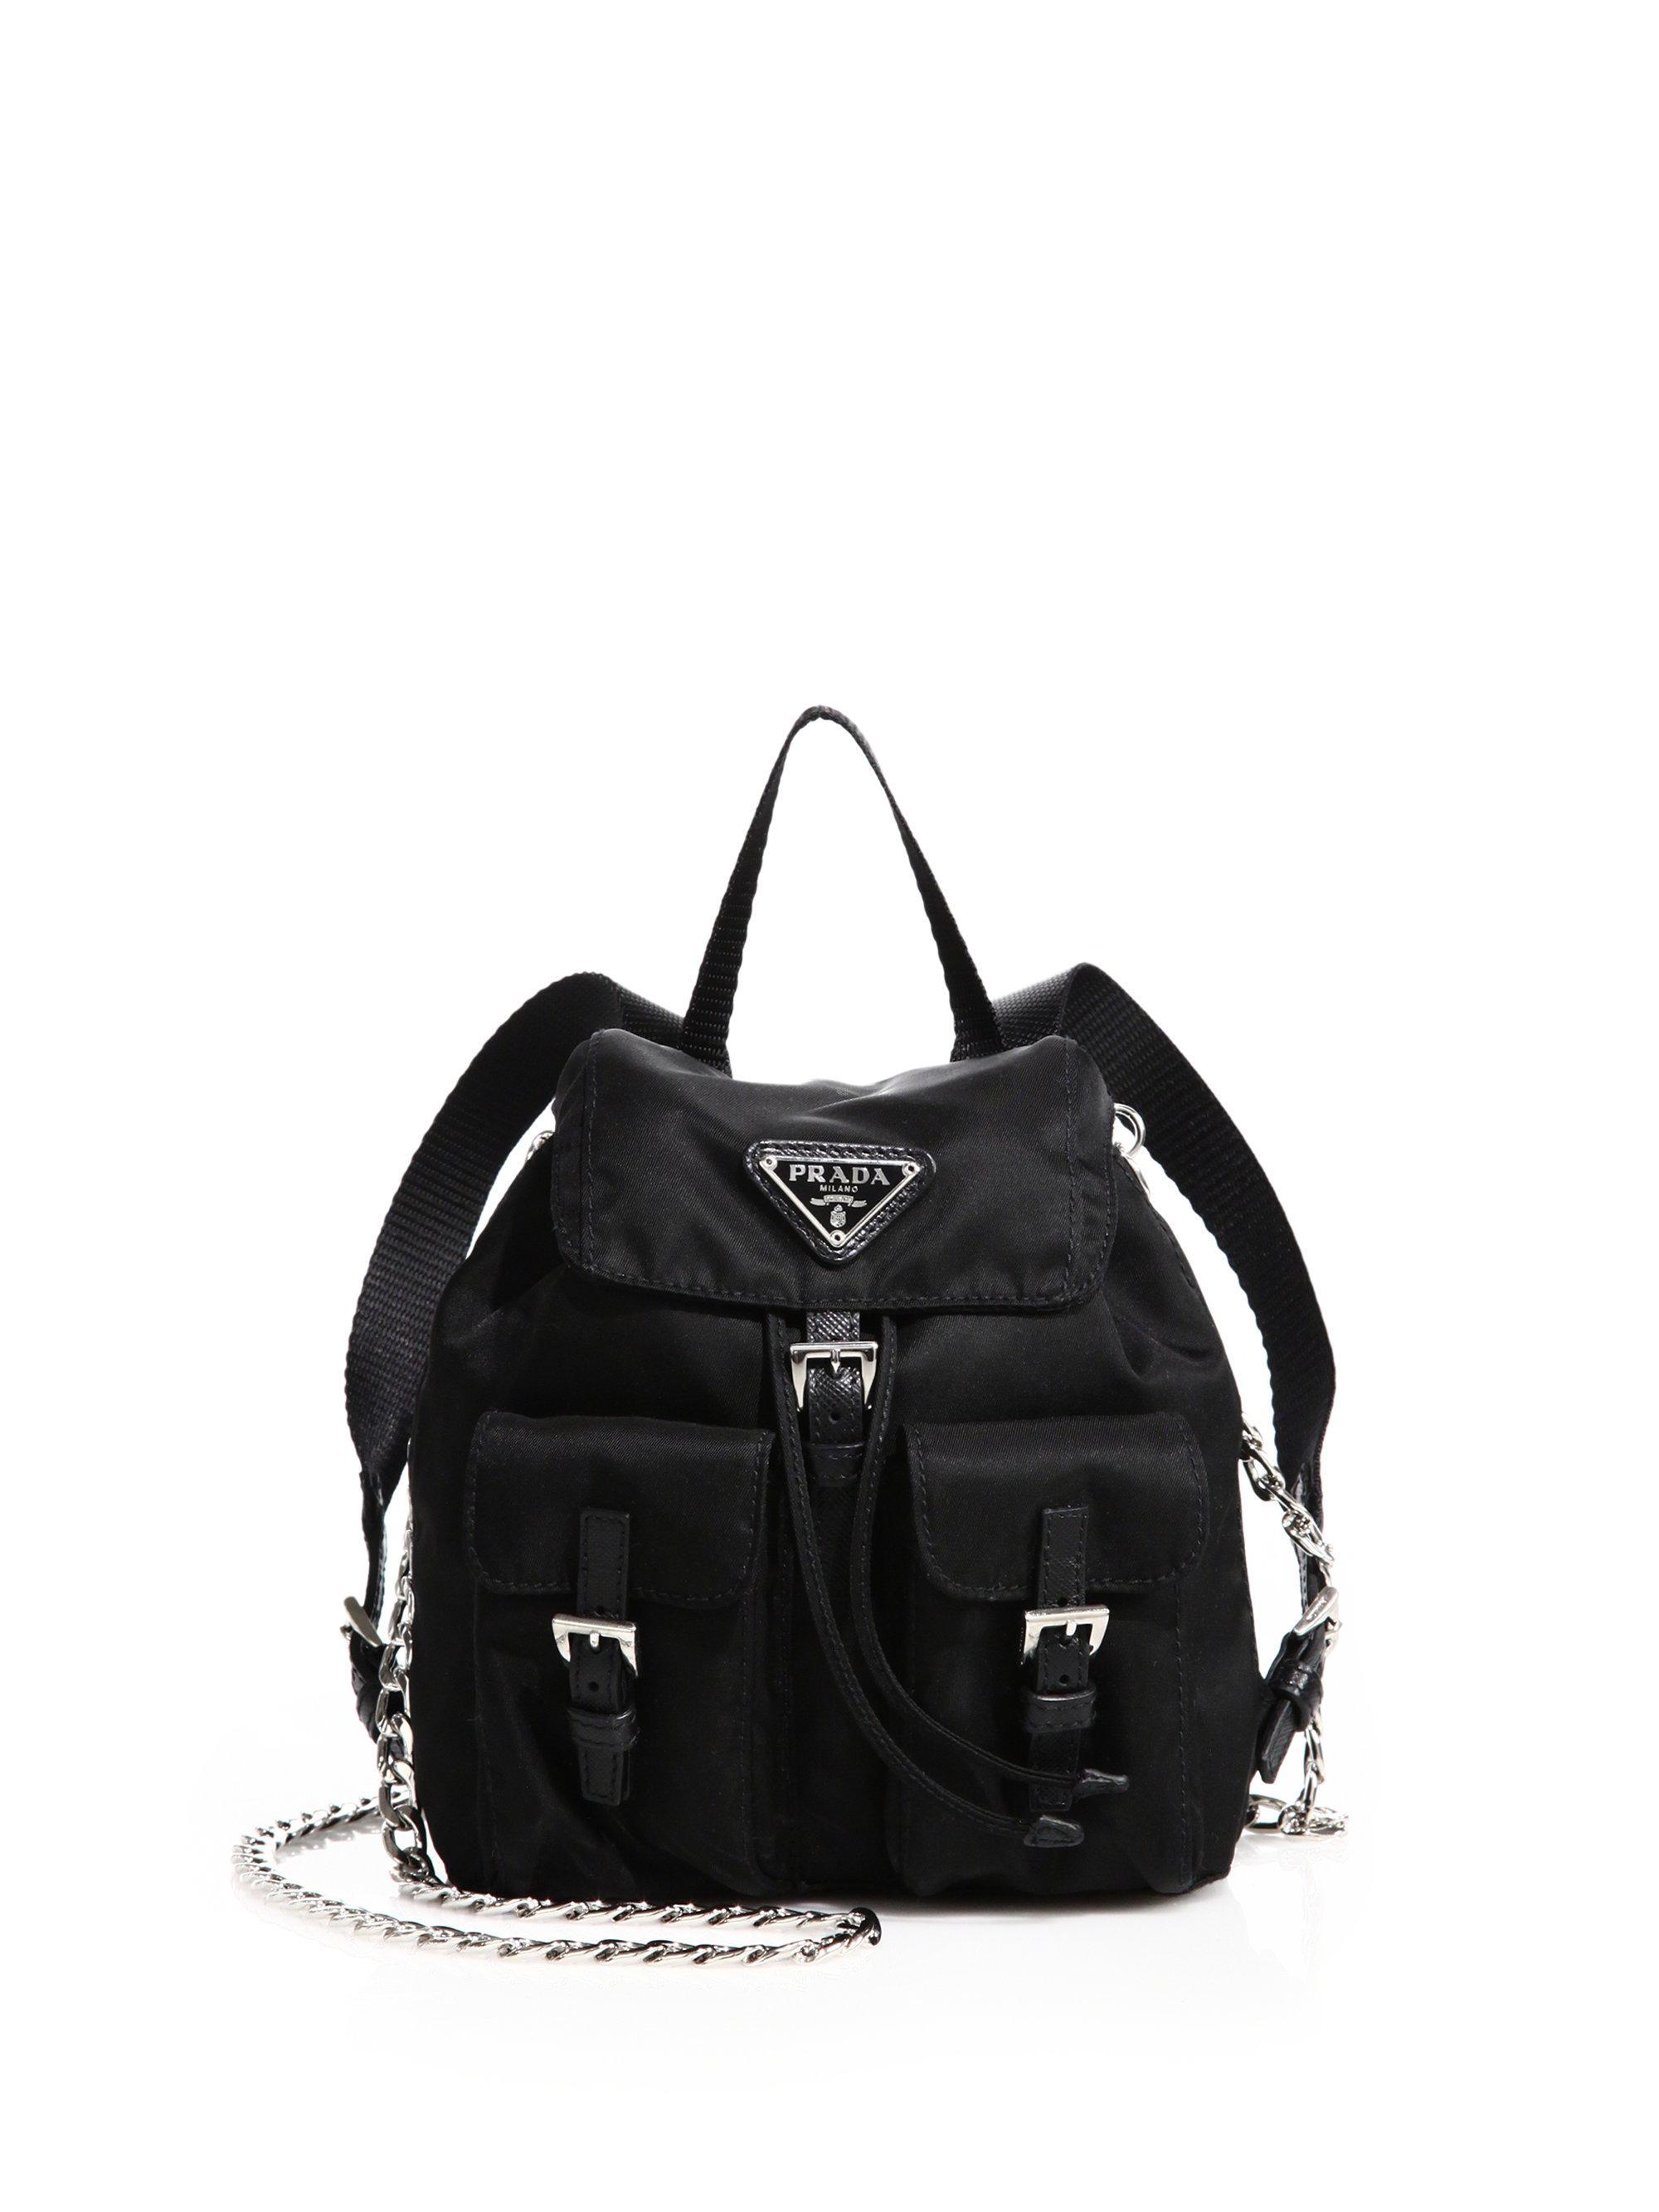 ca52d49002df ... sale lyst prada calf leather single handle backpack in black acea1 f4839